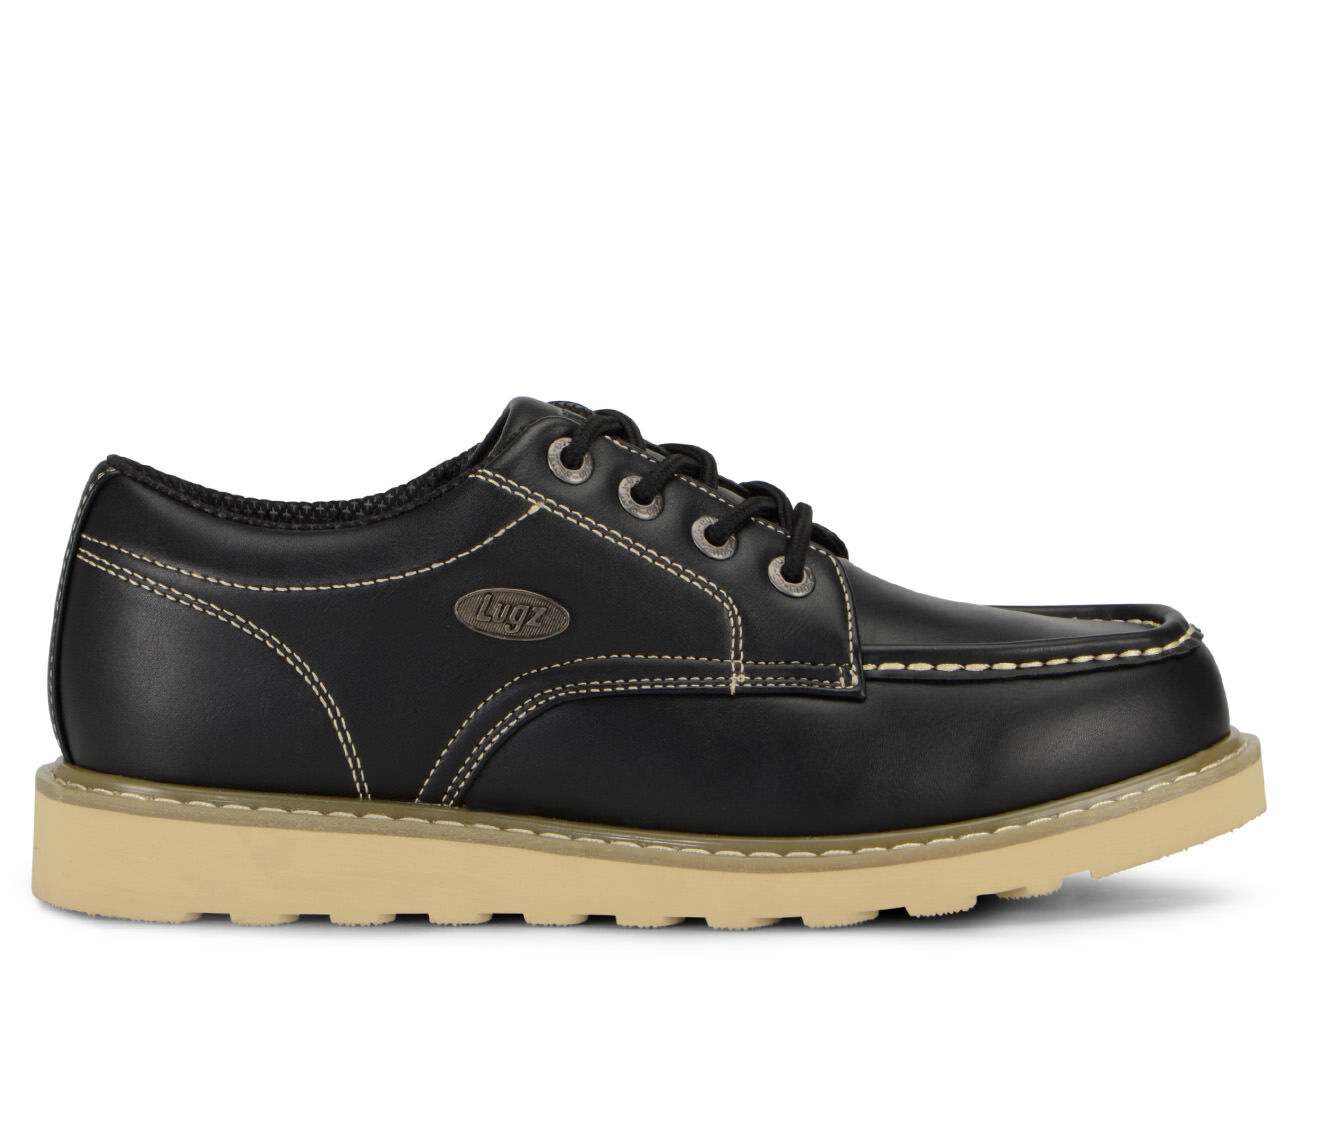 Men's Lugz Roamer Low Boots Black/Gum/Cream